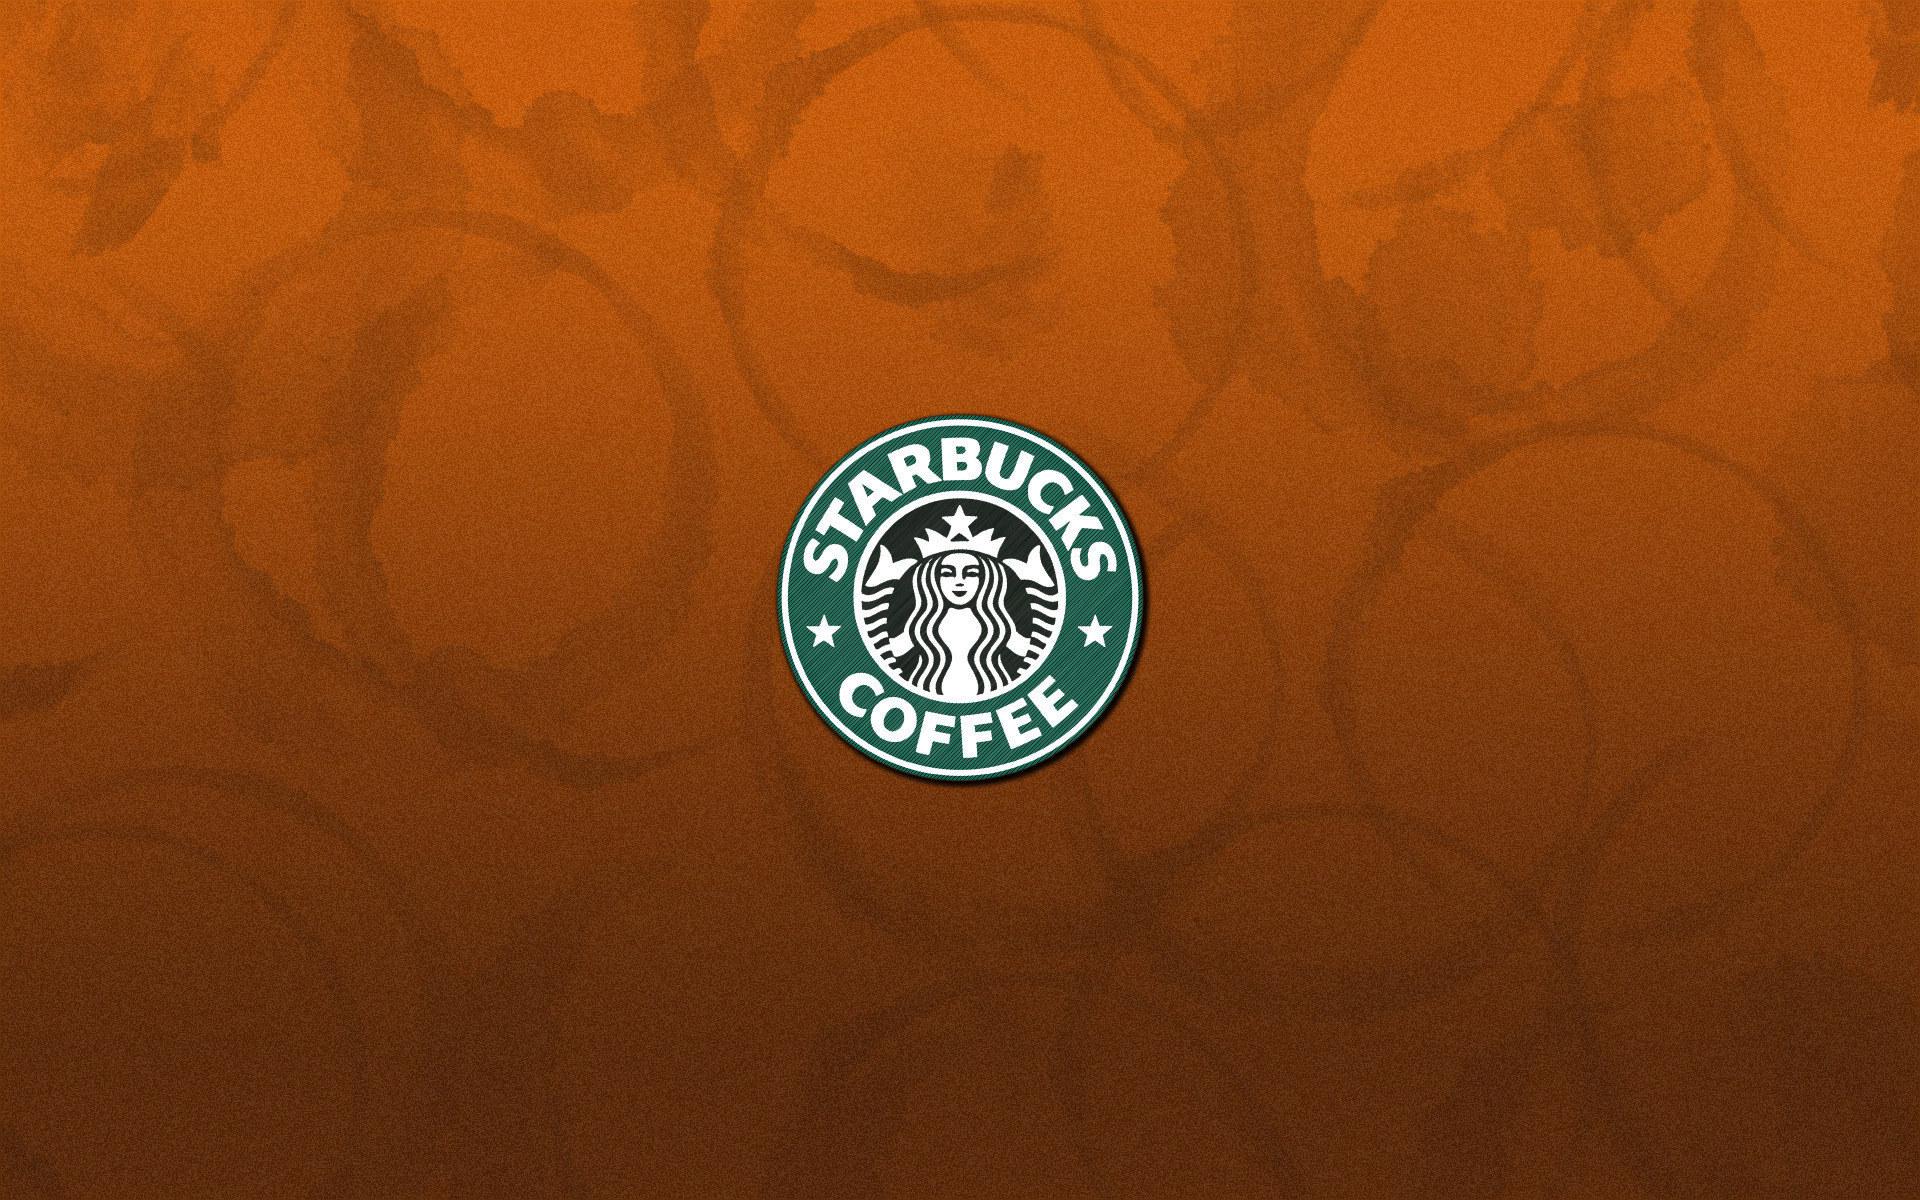 Starbucks星巴克LOGO桌面壁纸大全 Starbucks星巴克LOGO桌面壁纸大全专辑下载-找素材网